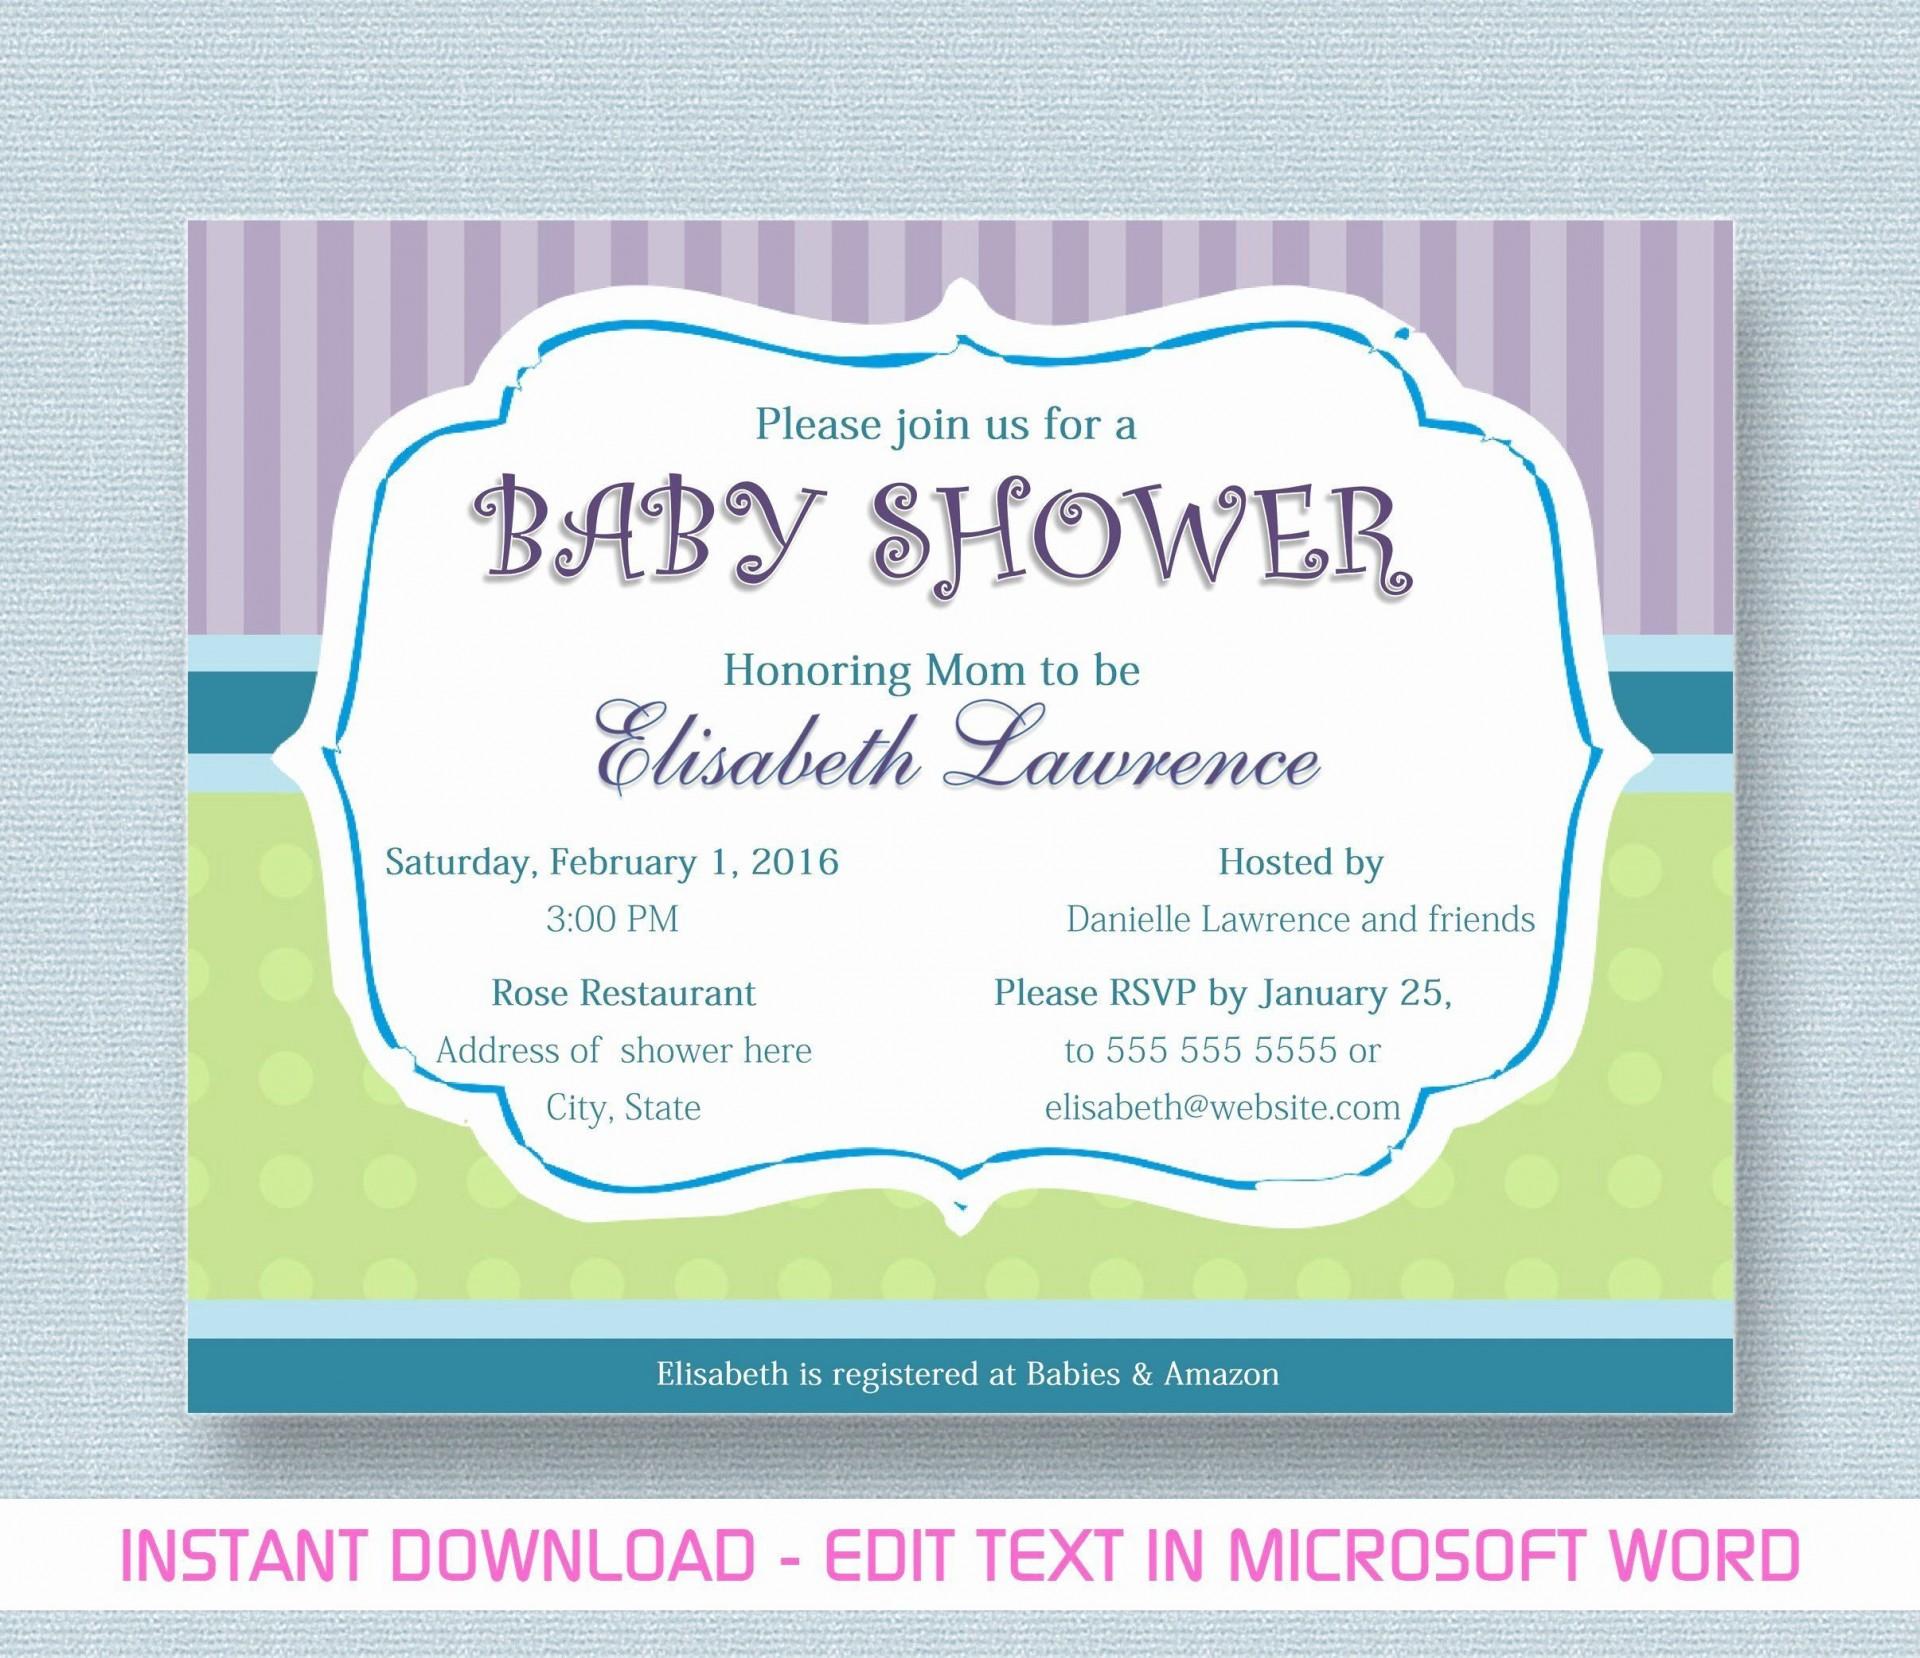 000 Phenomenal Microsoft Word Invitation Template Baby Shower Design  Free Editable Invite1920